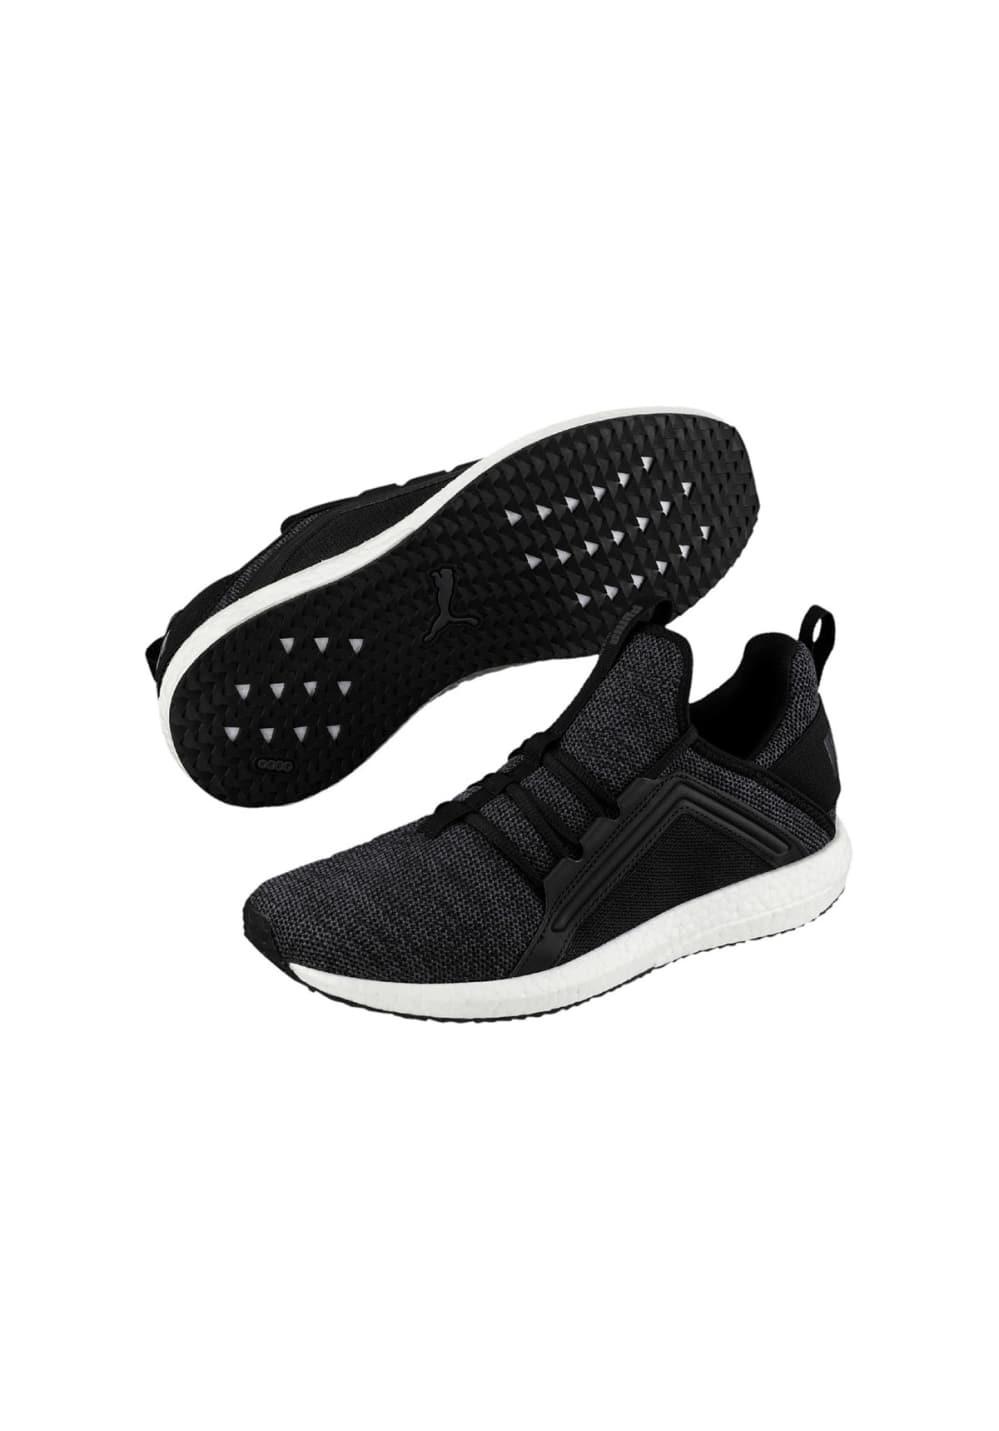 f18d4307ee8 ... Puma Mega Nrgy Knit - Running shoes for Men - Black. Back to Overview.  -40%